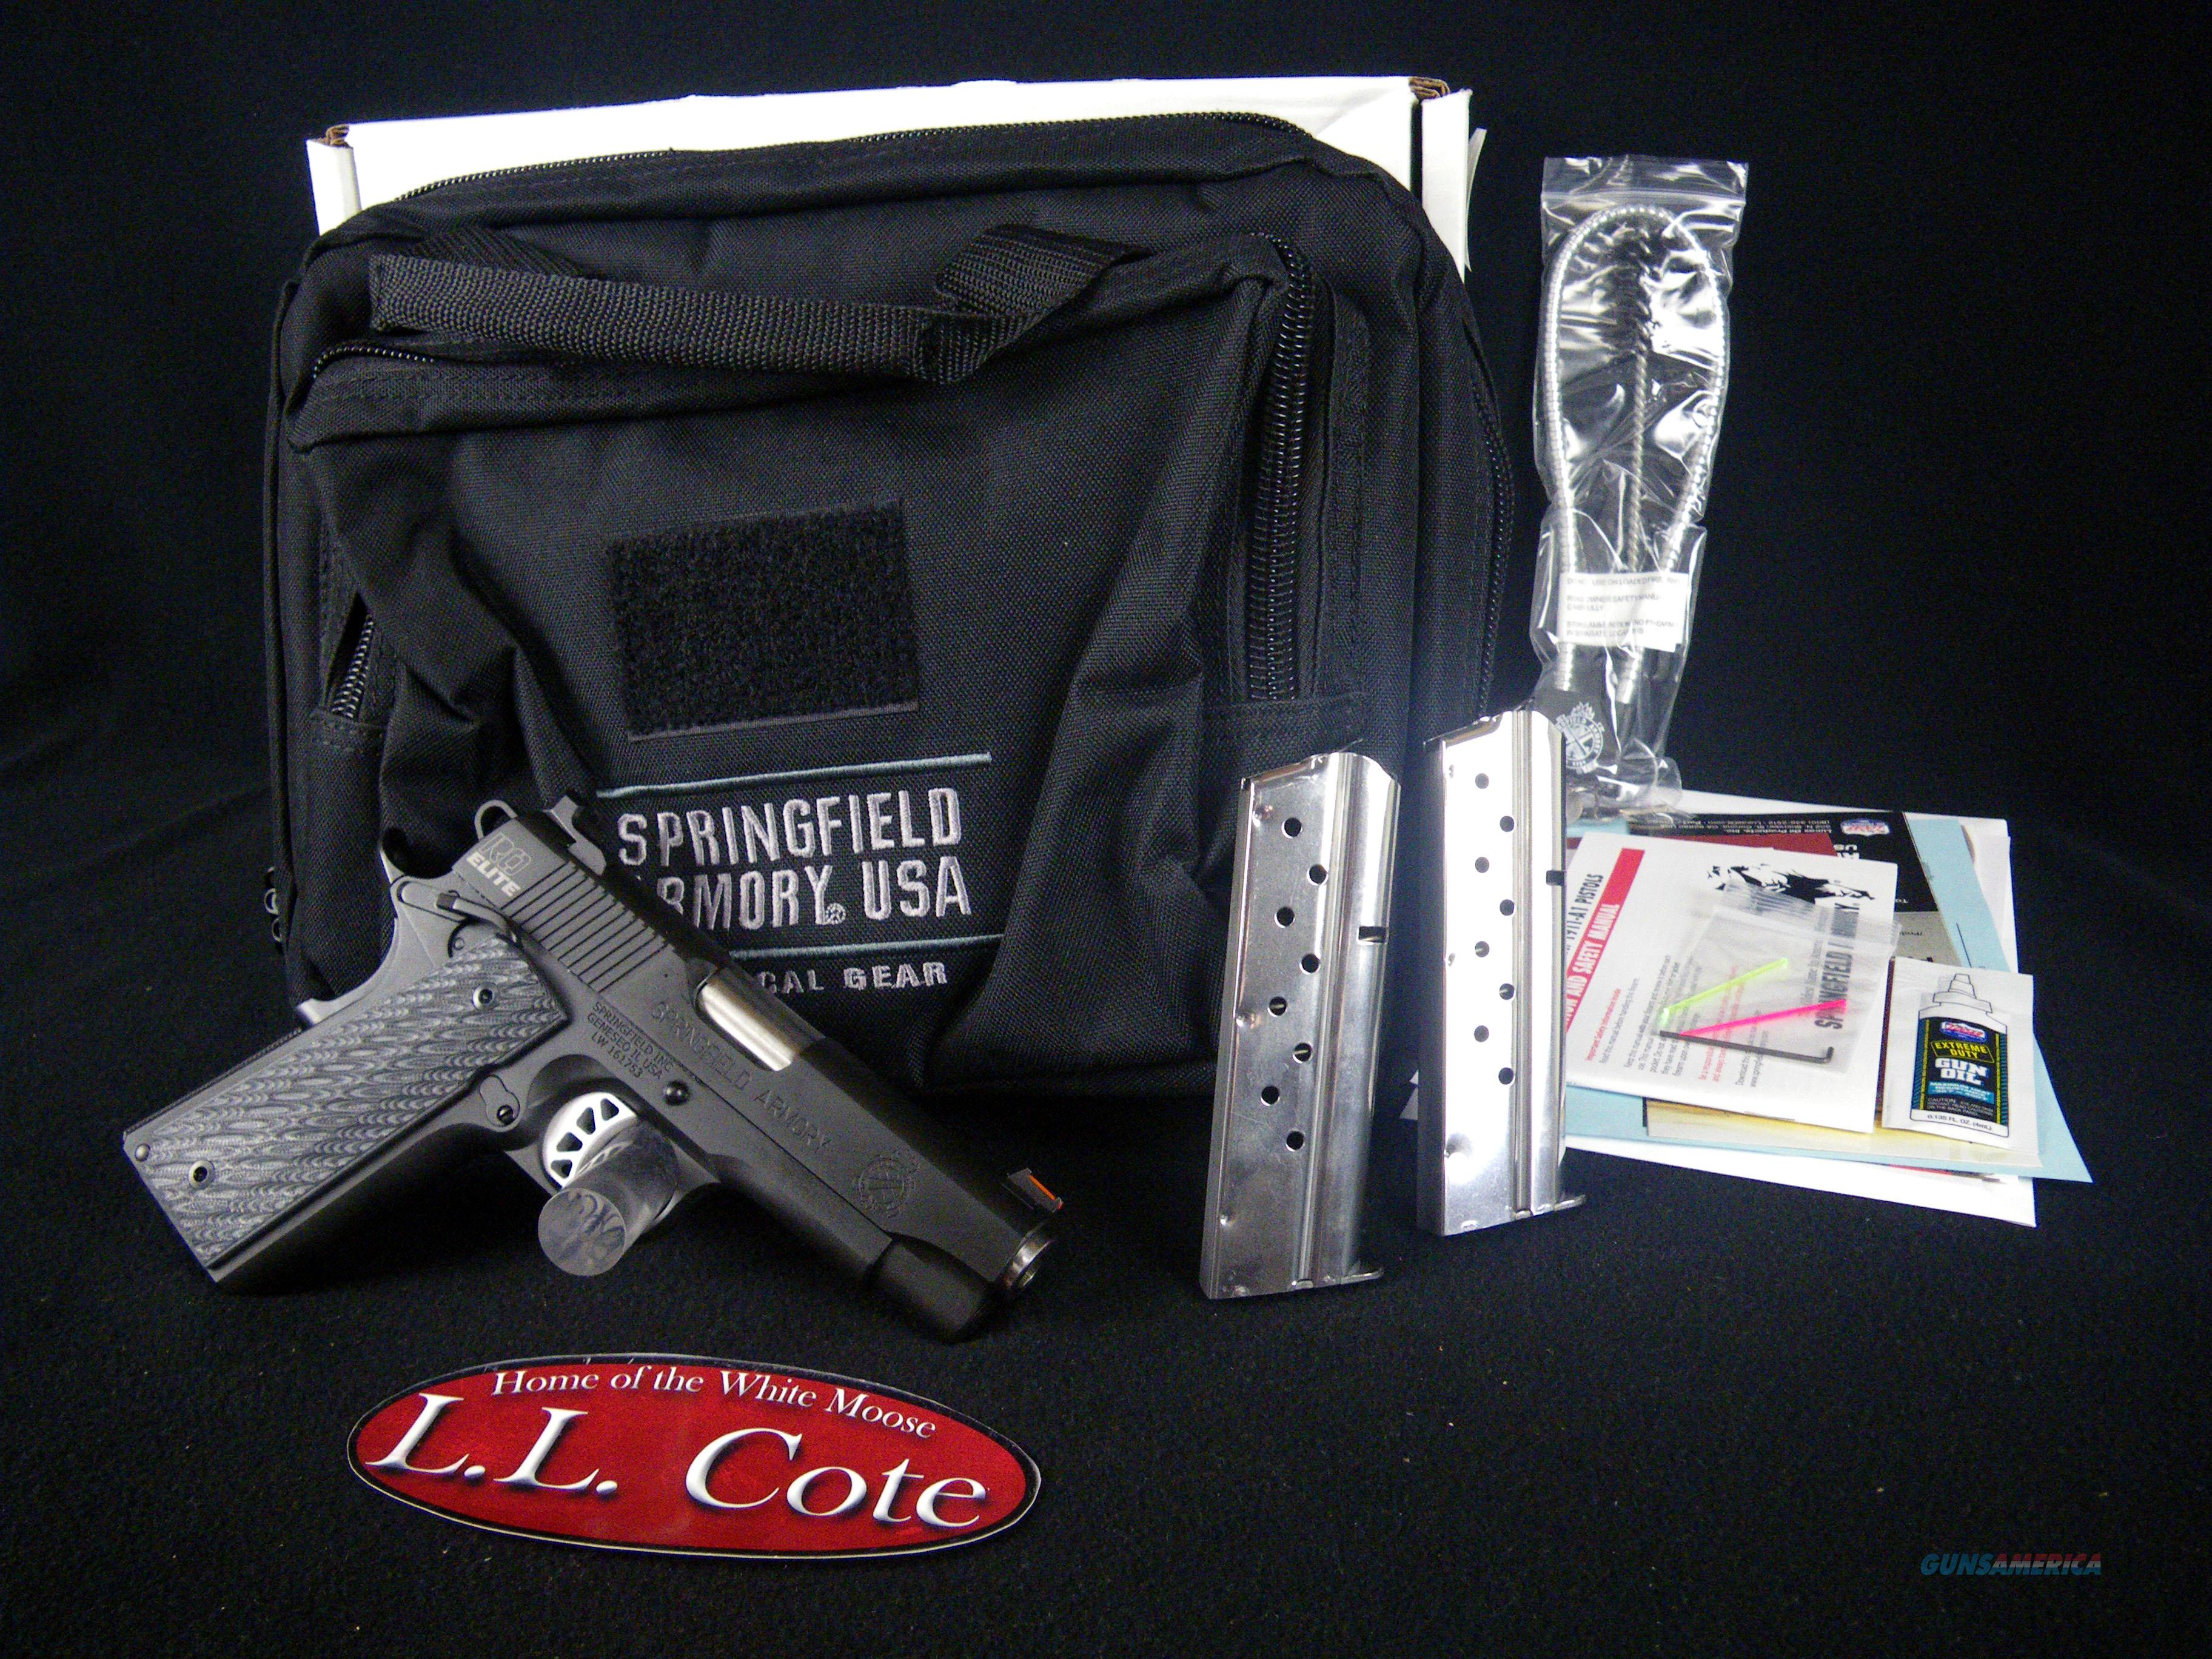 "Springfield 1911 RO Elite Champion 9mm 4"" NEW PI9137E  Guns > Pistols > Springfield Armory Pistols > 1911 Type"